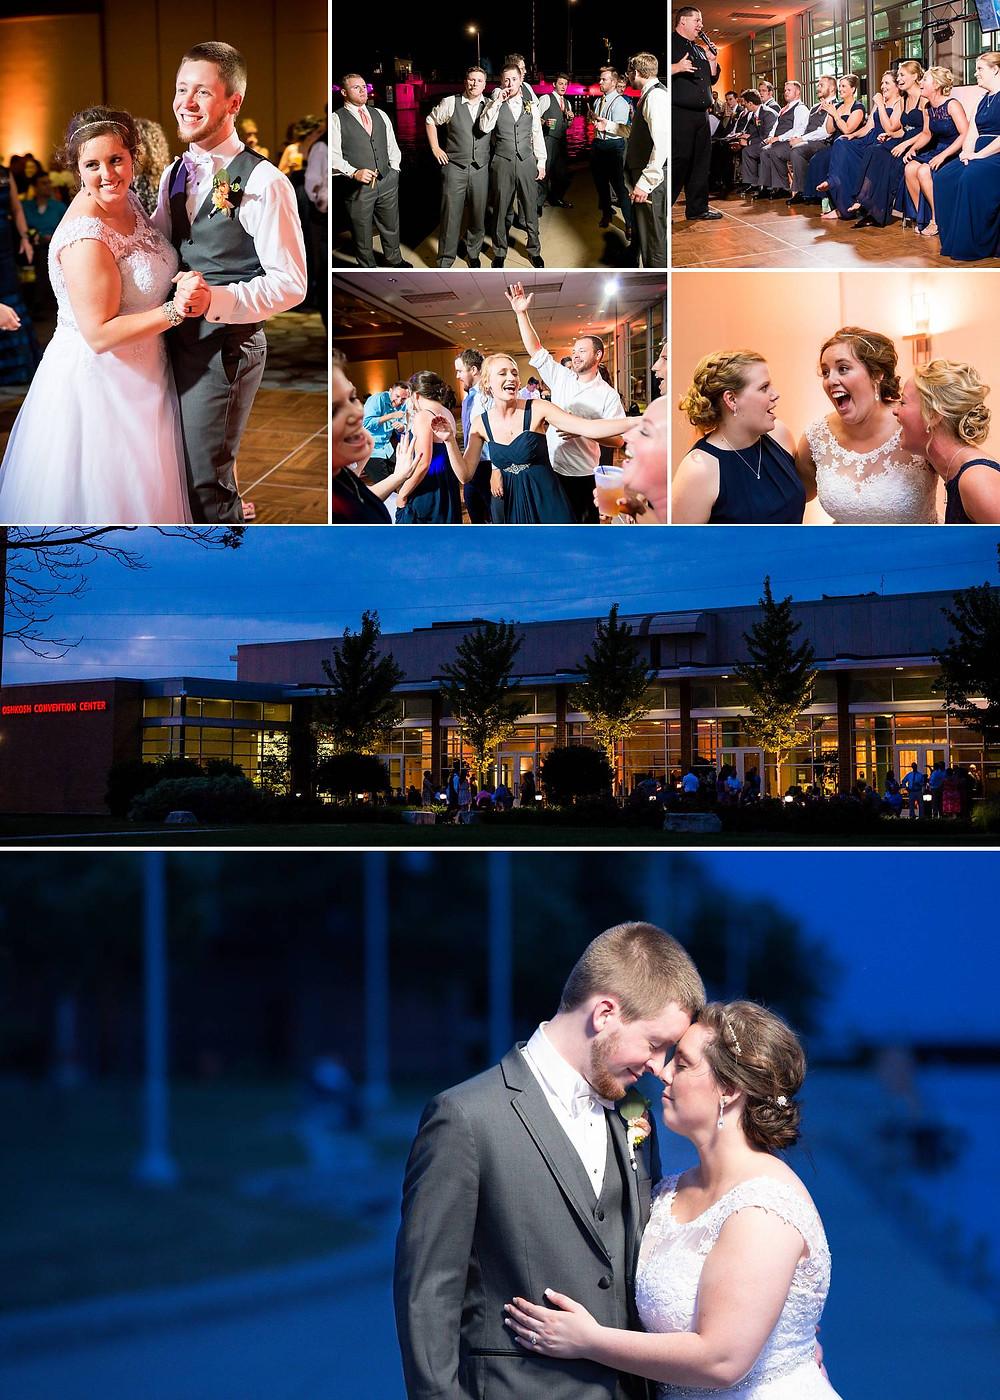 Oshkosh Wisconsin Convention Center Wedding Reception | Lanari Photography